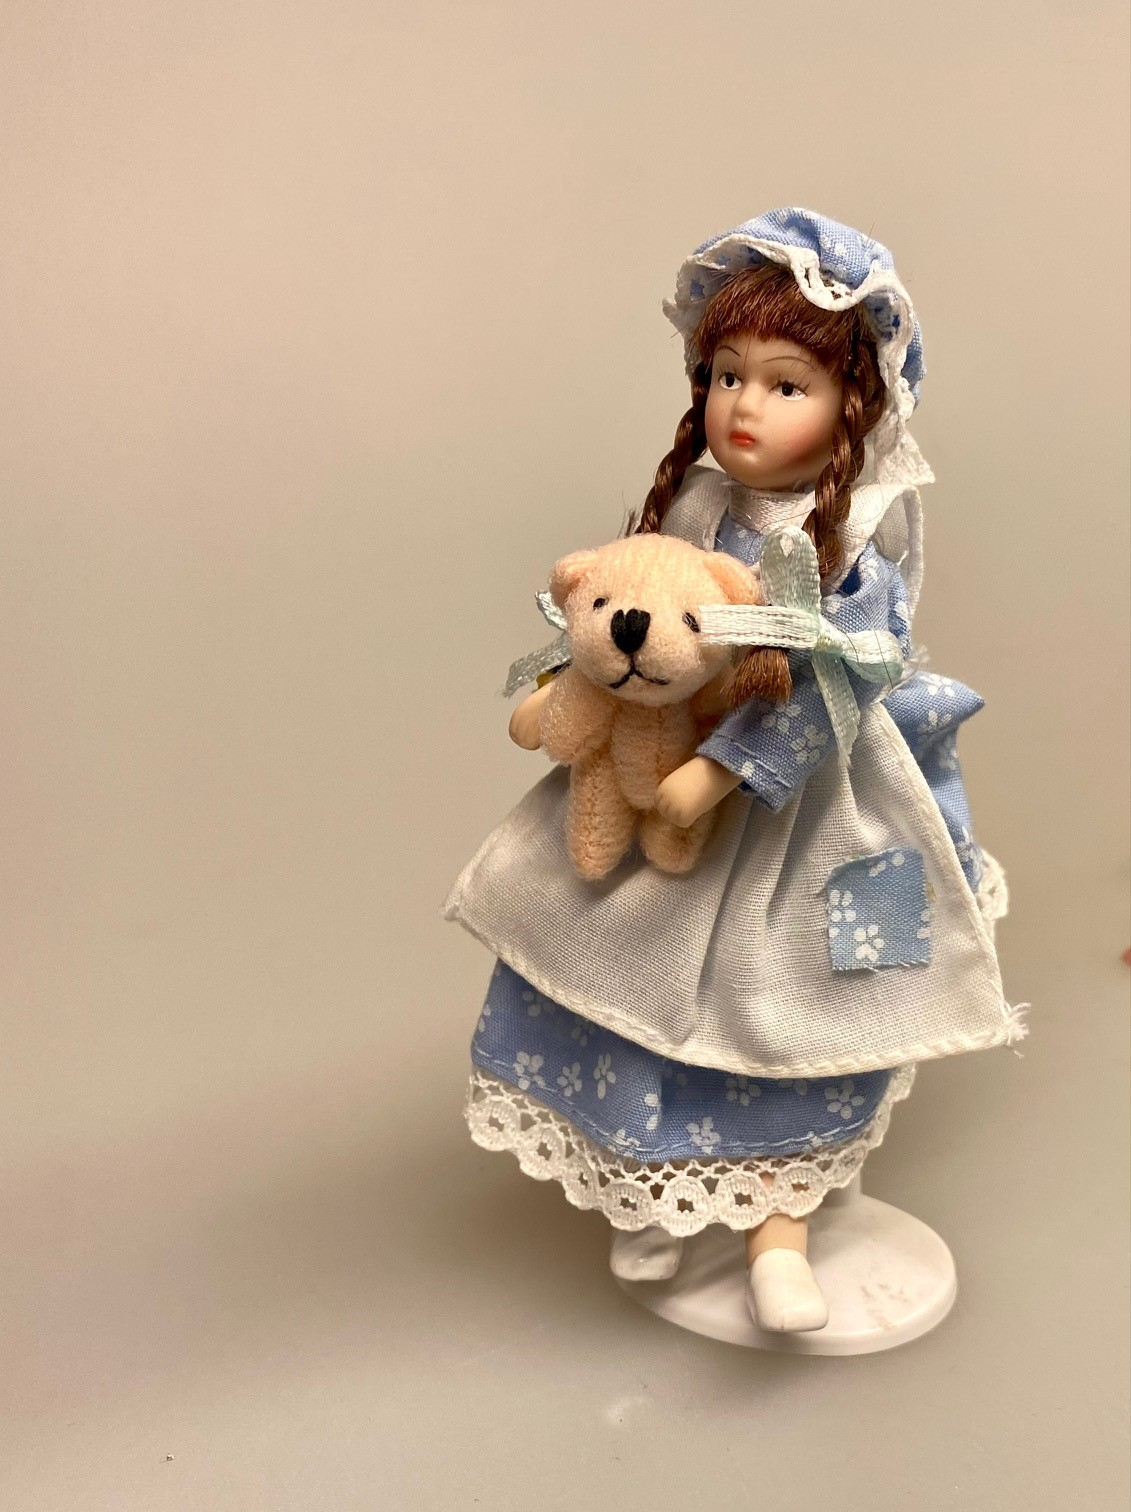 Miniature bamse rosa, Miniature bamse hvid, mini, micro, lillebitte, bamse, plyds, plydsbamse, plydsbjørn, teddy, teddybjørn, krammebamse, dukkehus, dukkehuset, sætterkasse, sættekasseting, sættekasse, sættekassen, amagerhydlen, nisserne, nissehus, nissebo, nissedør, småt, biti, ribe, 1:12